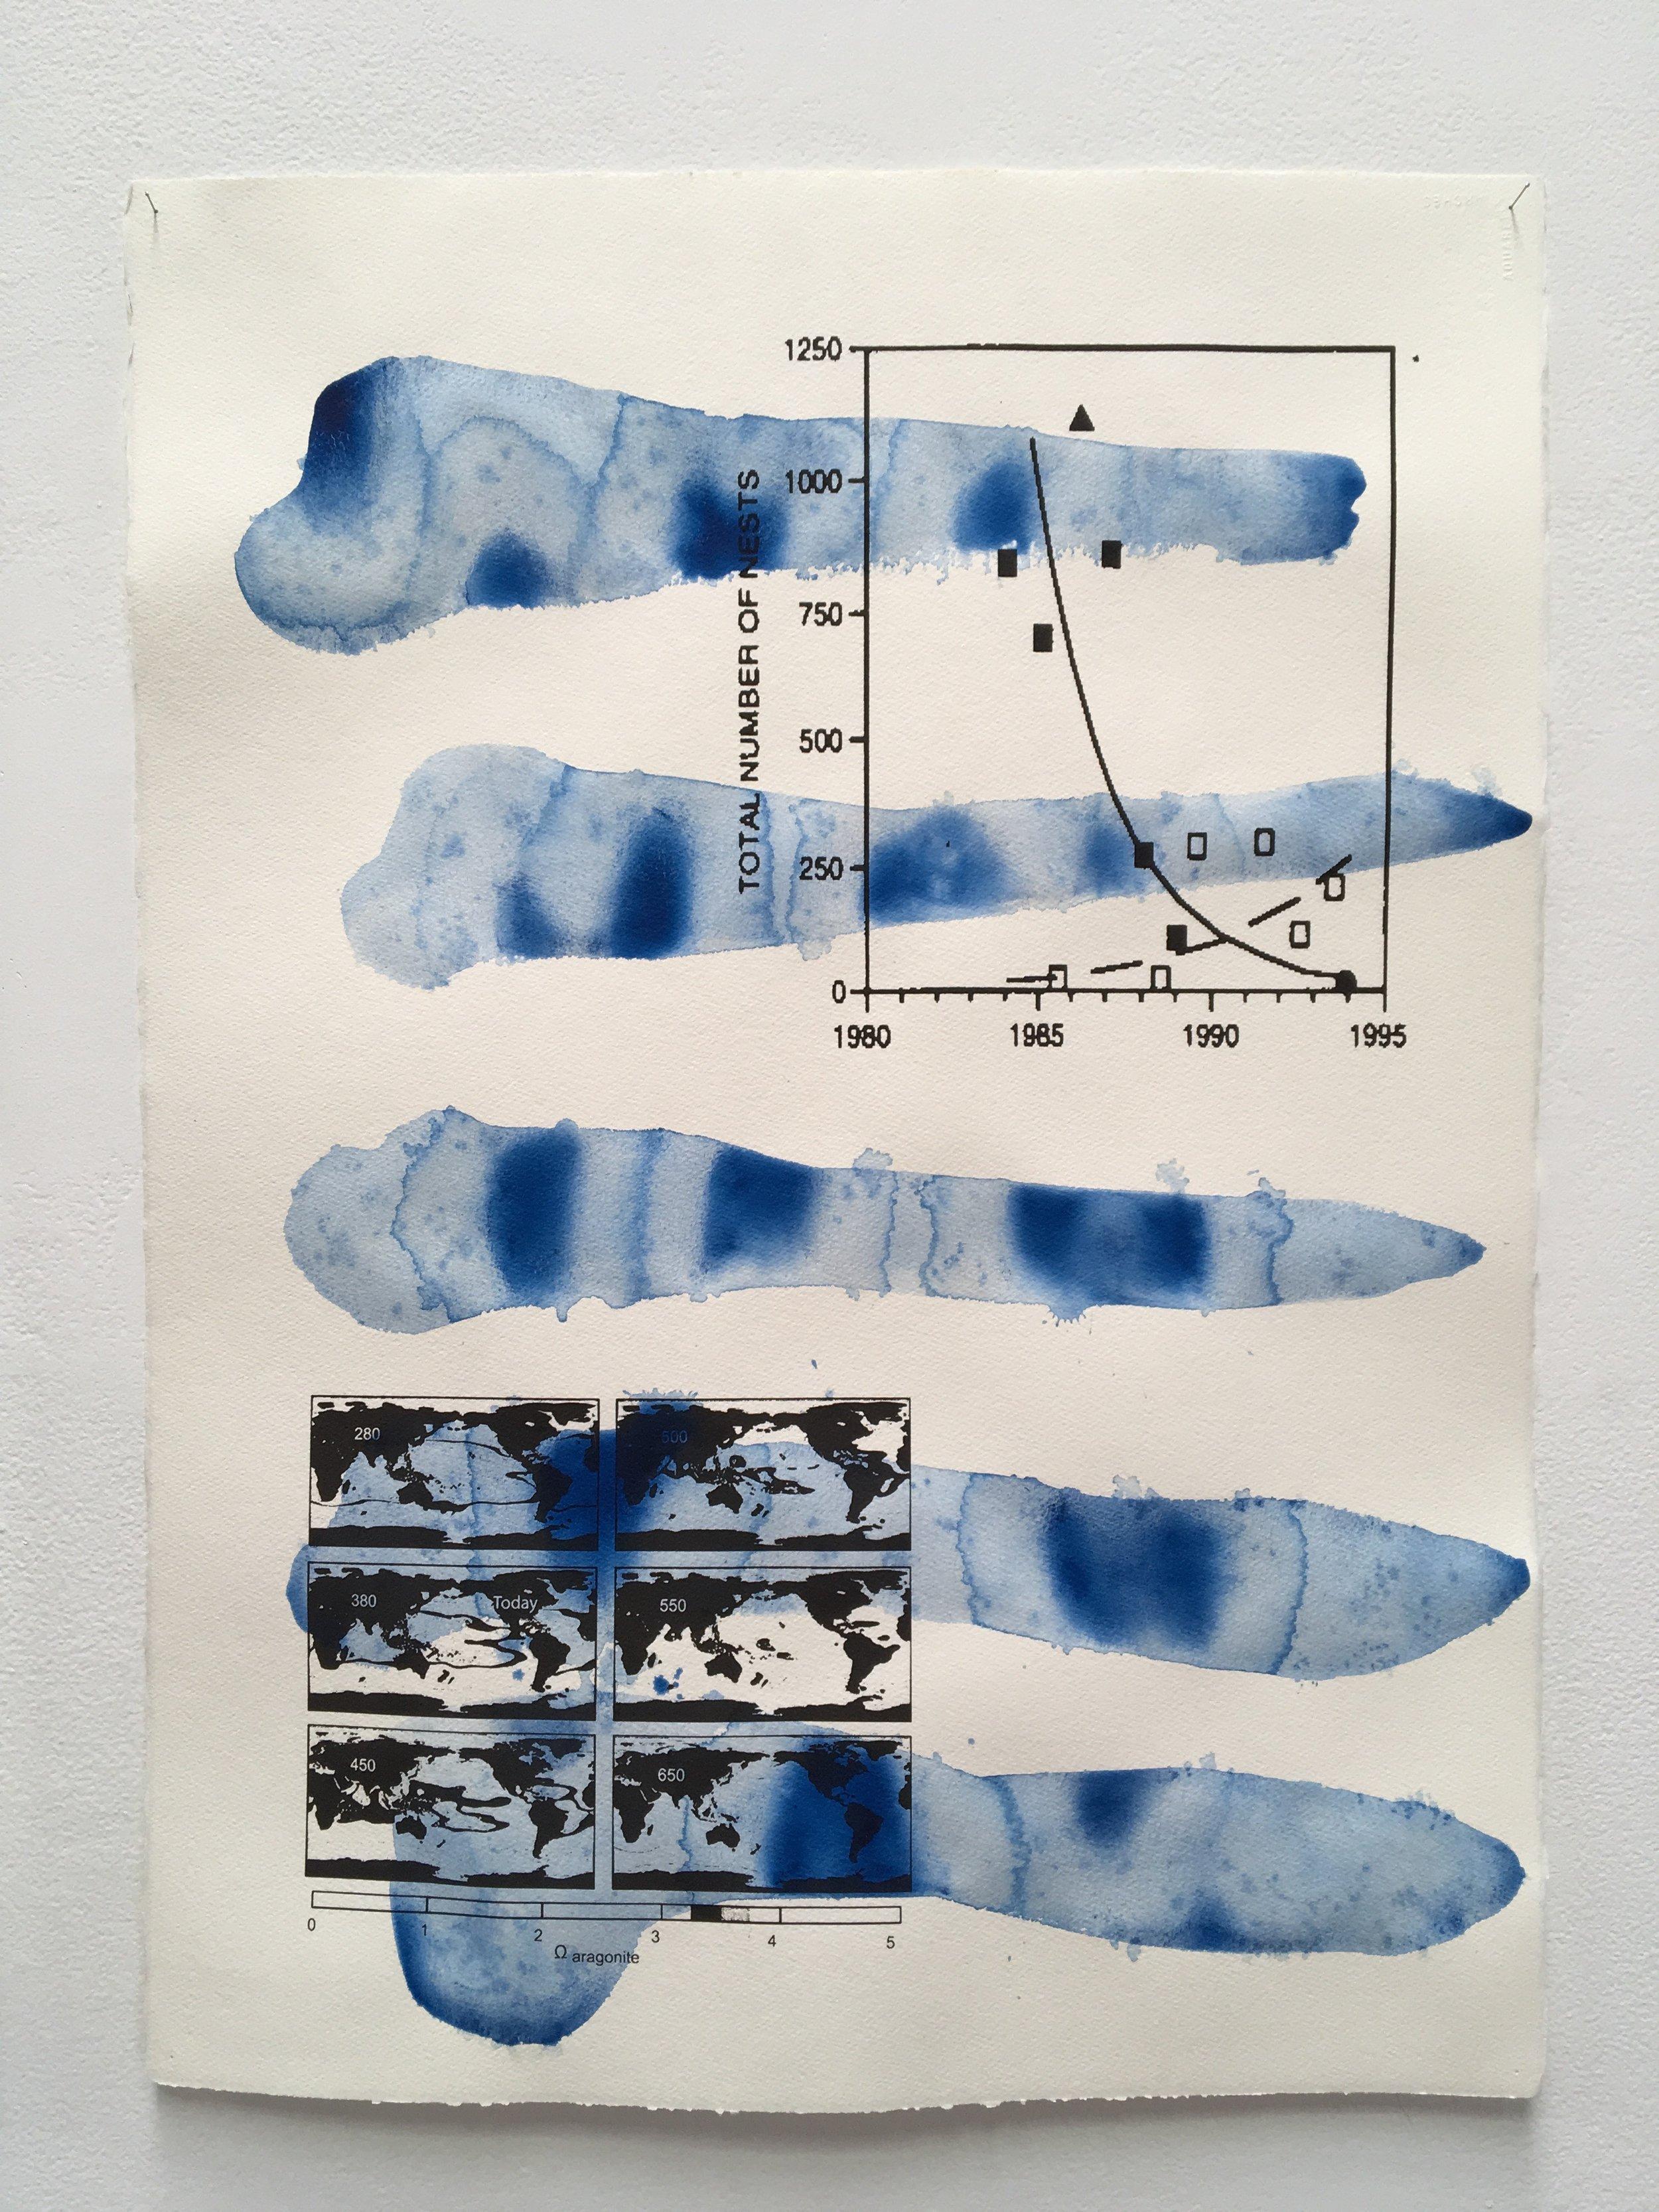 Judy Watson heron island 9 2009-16 acrylic and digital print on paper 77 x 57 cm.jpg